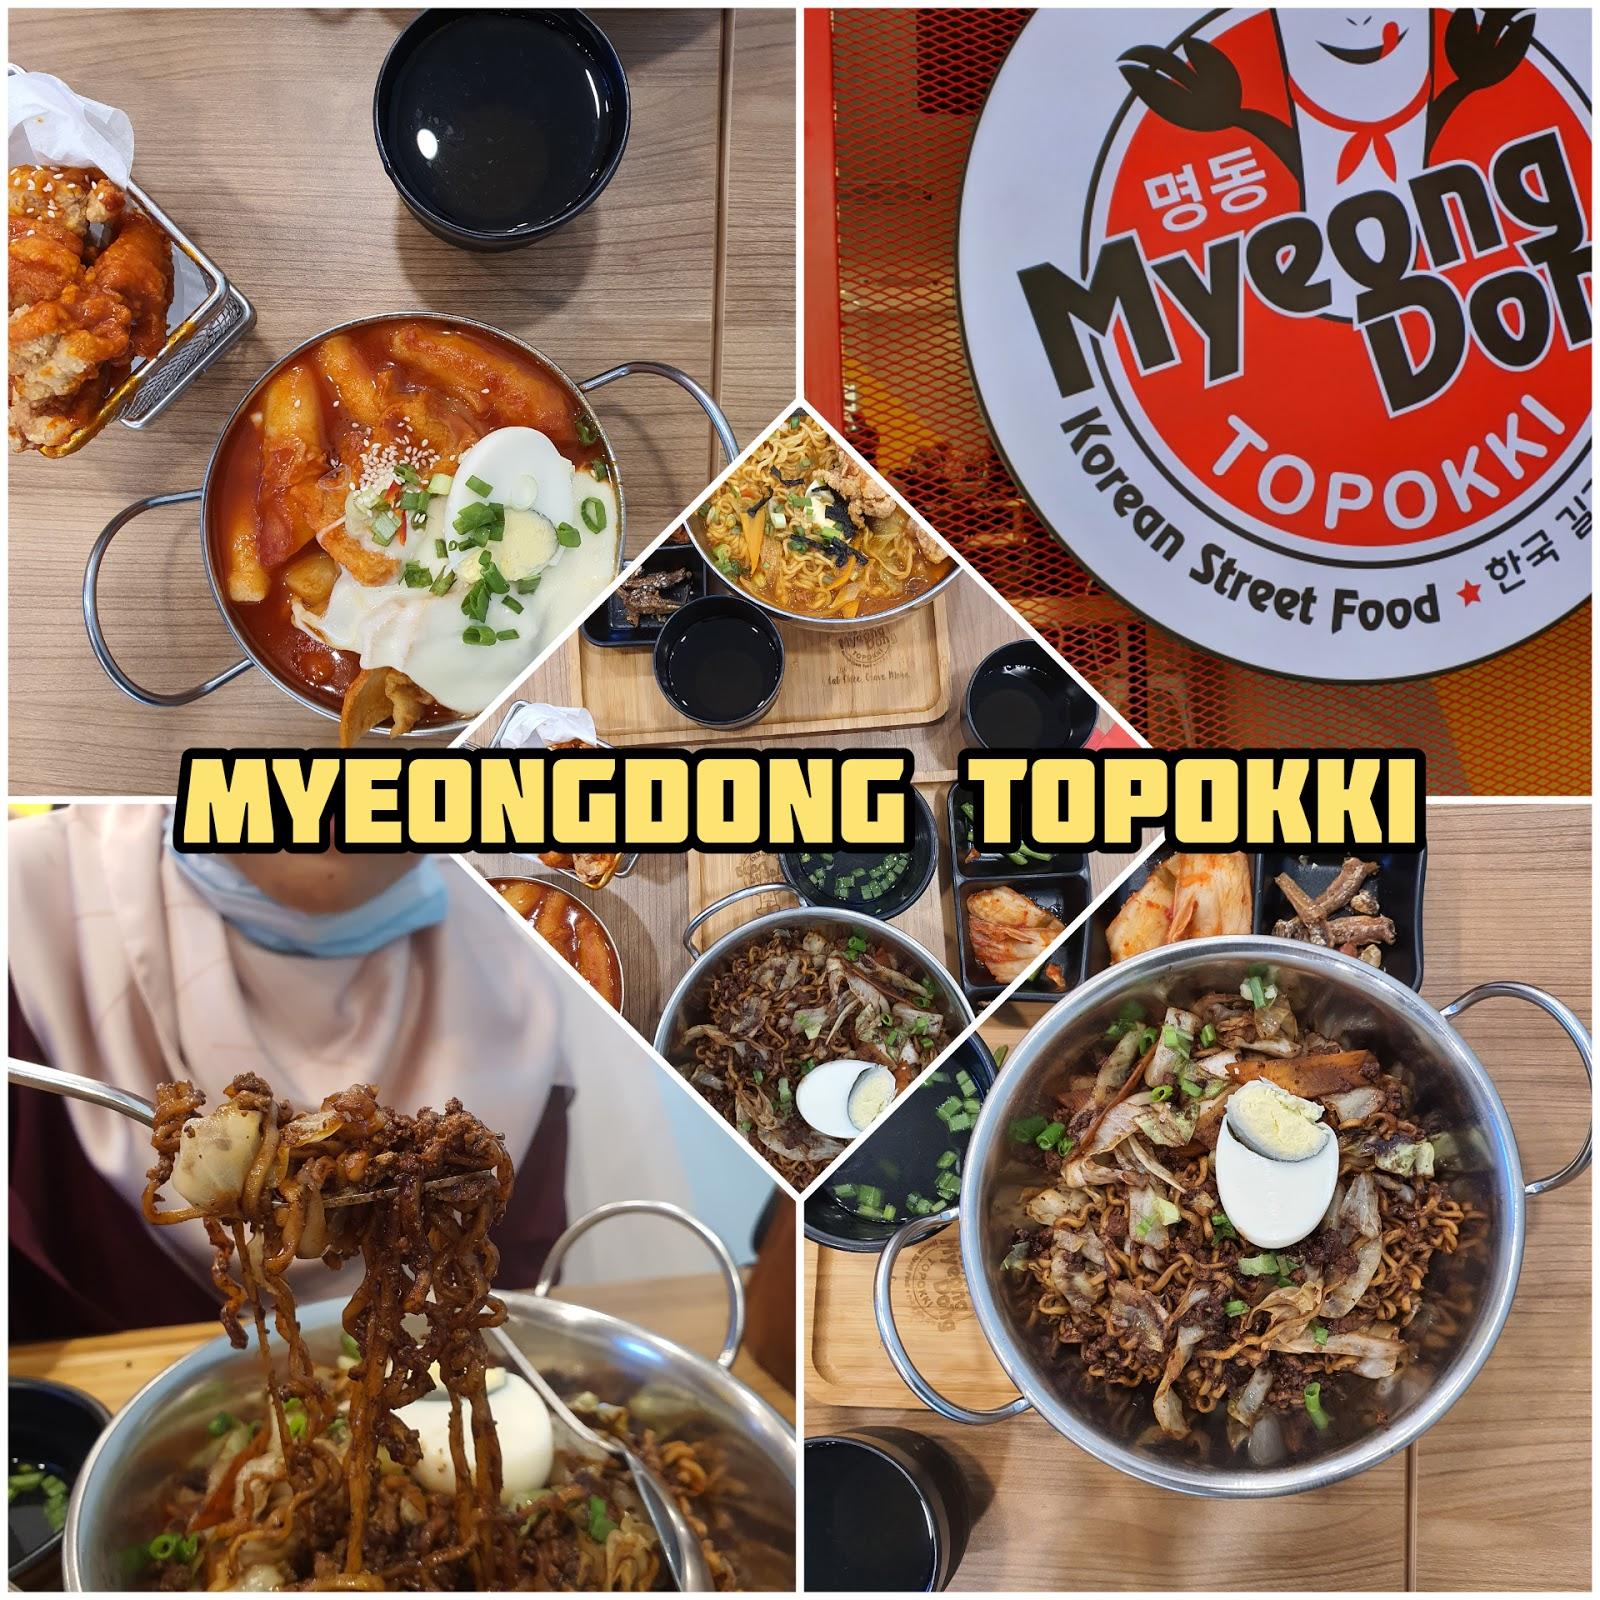 MyeongDong Topokki : Restoran Street Food Korea di Pulau Pinang